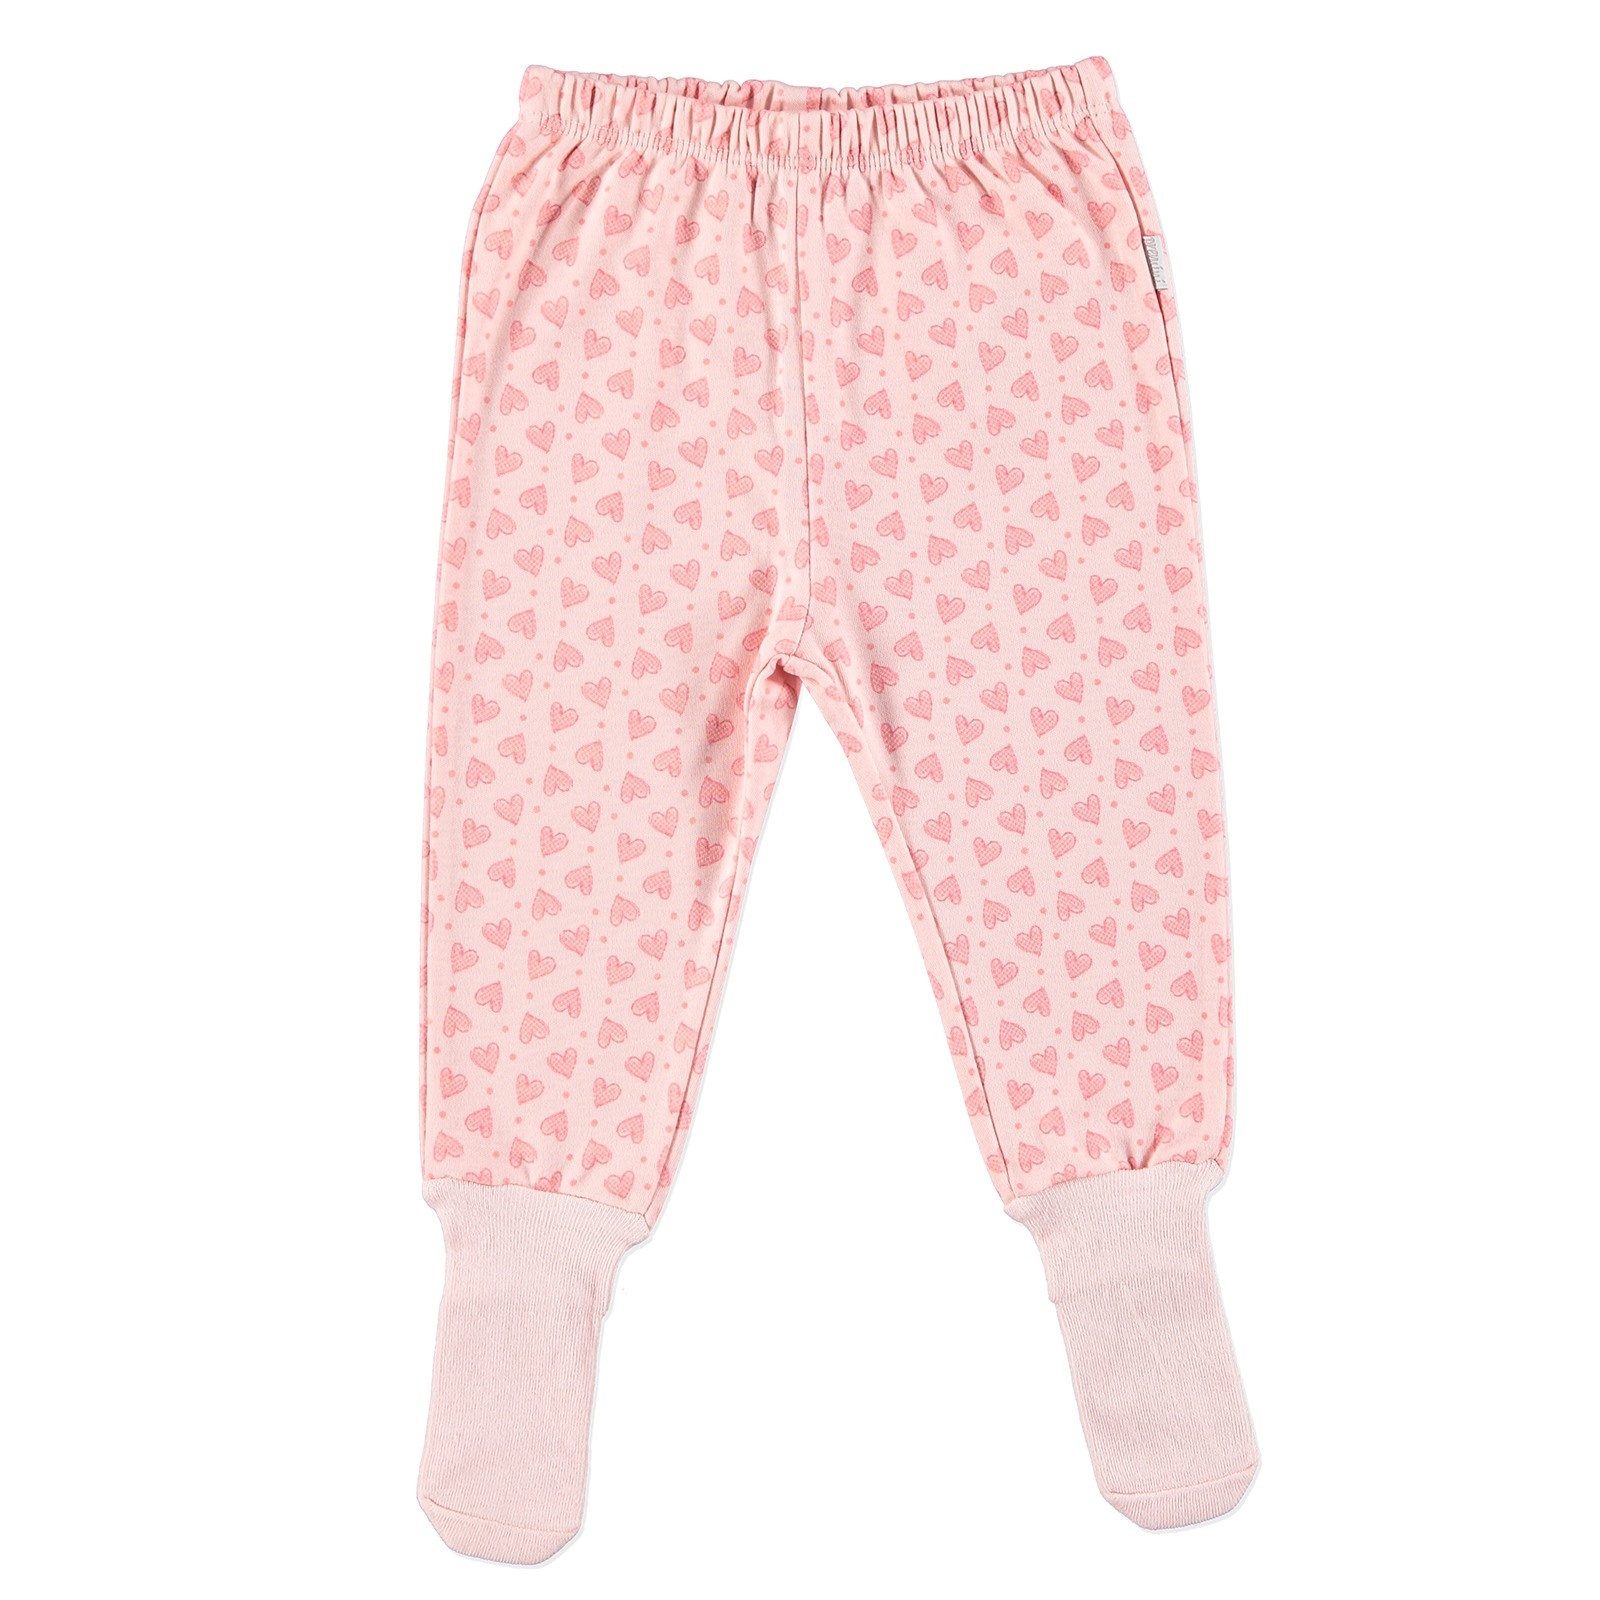 Ebebek Premini Heart Organic Baby Footed Trousers